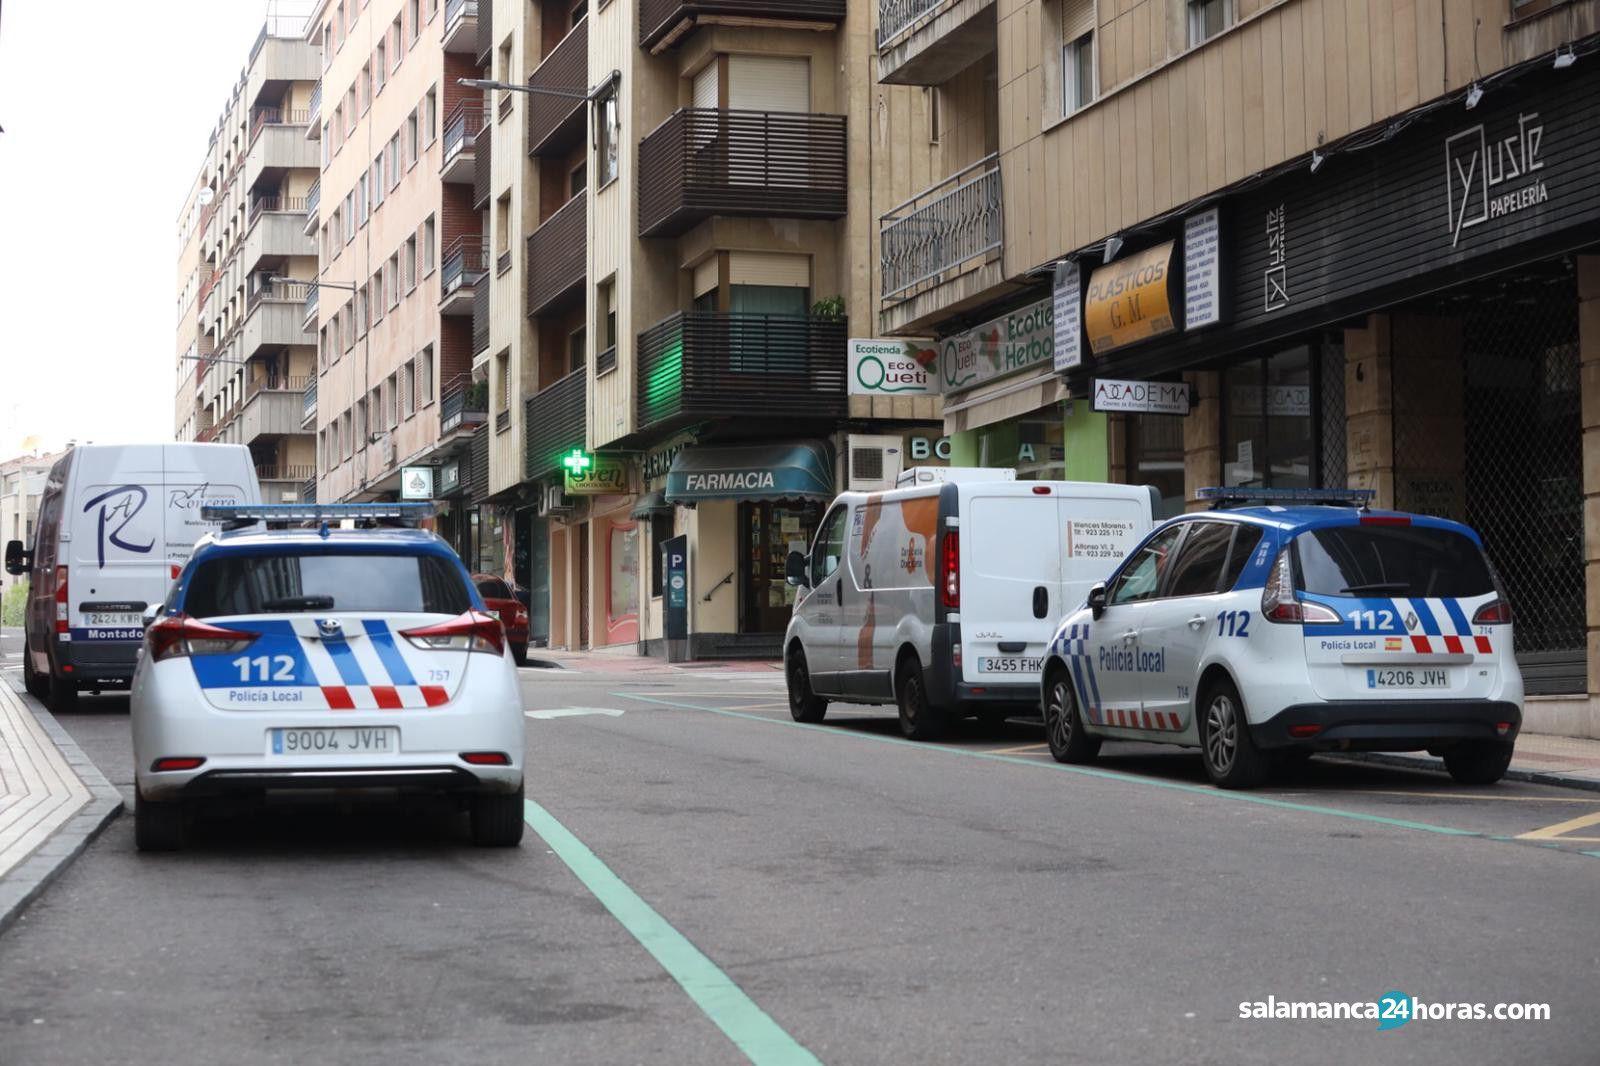 policía local wences moreno